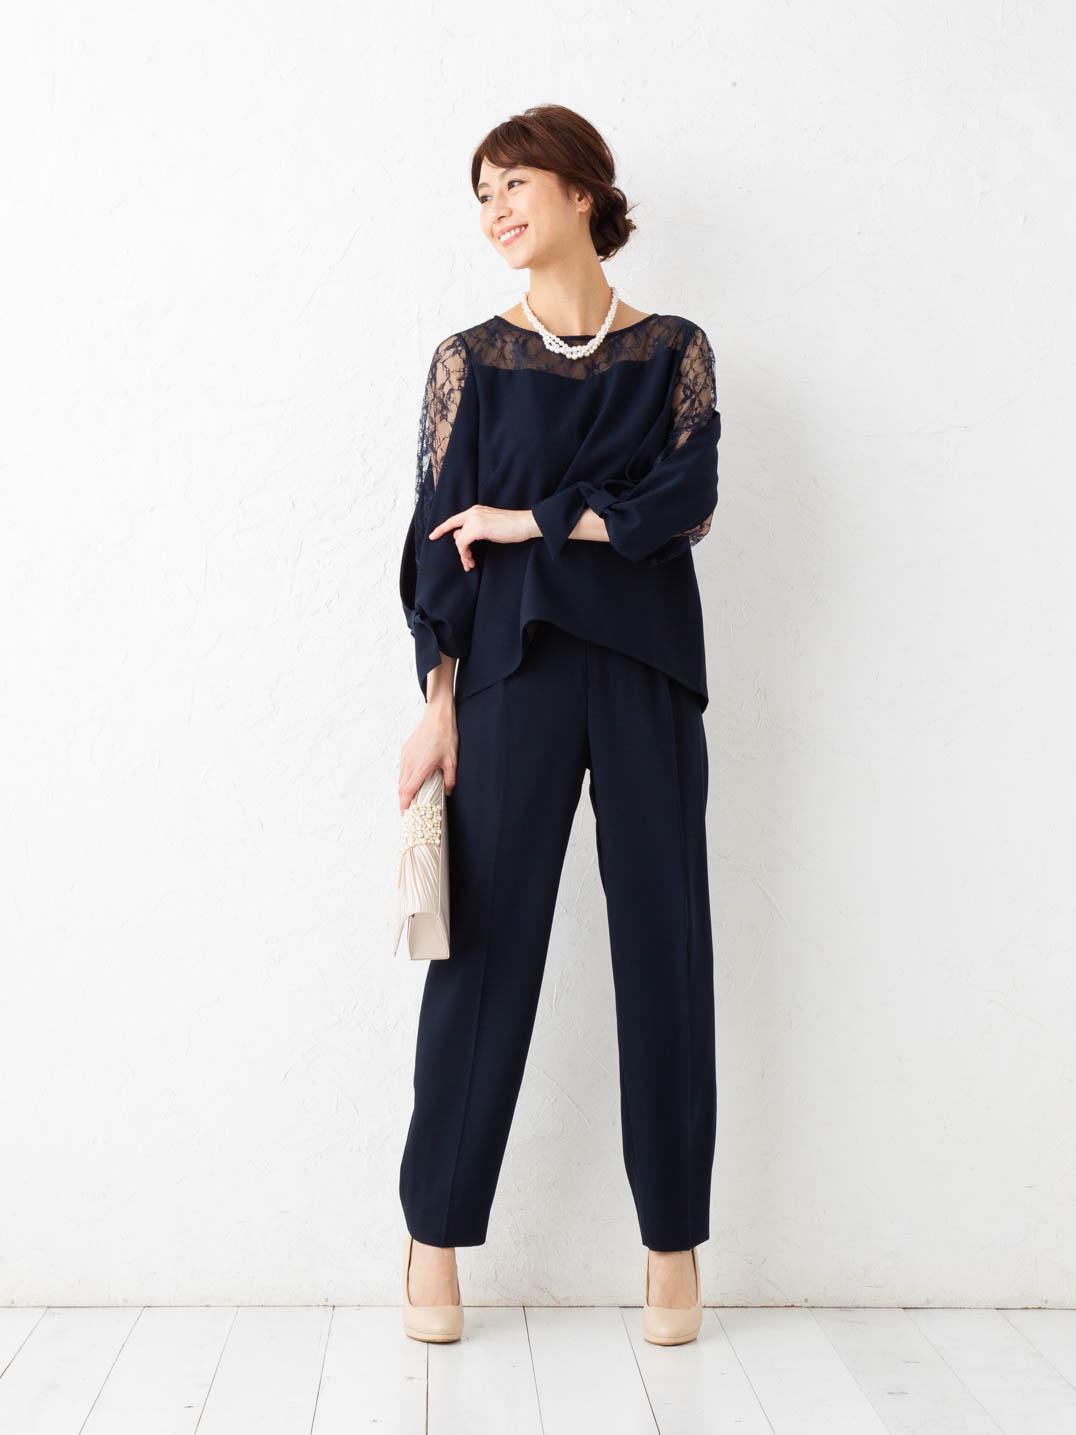 RYK ドレス / Mサイズ (DOC0104)